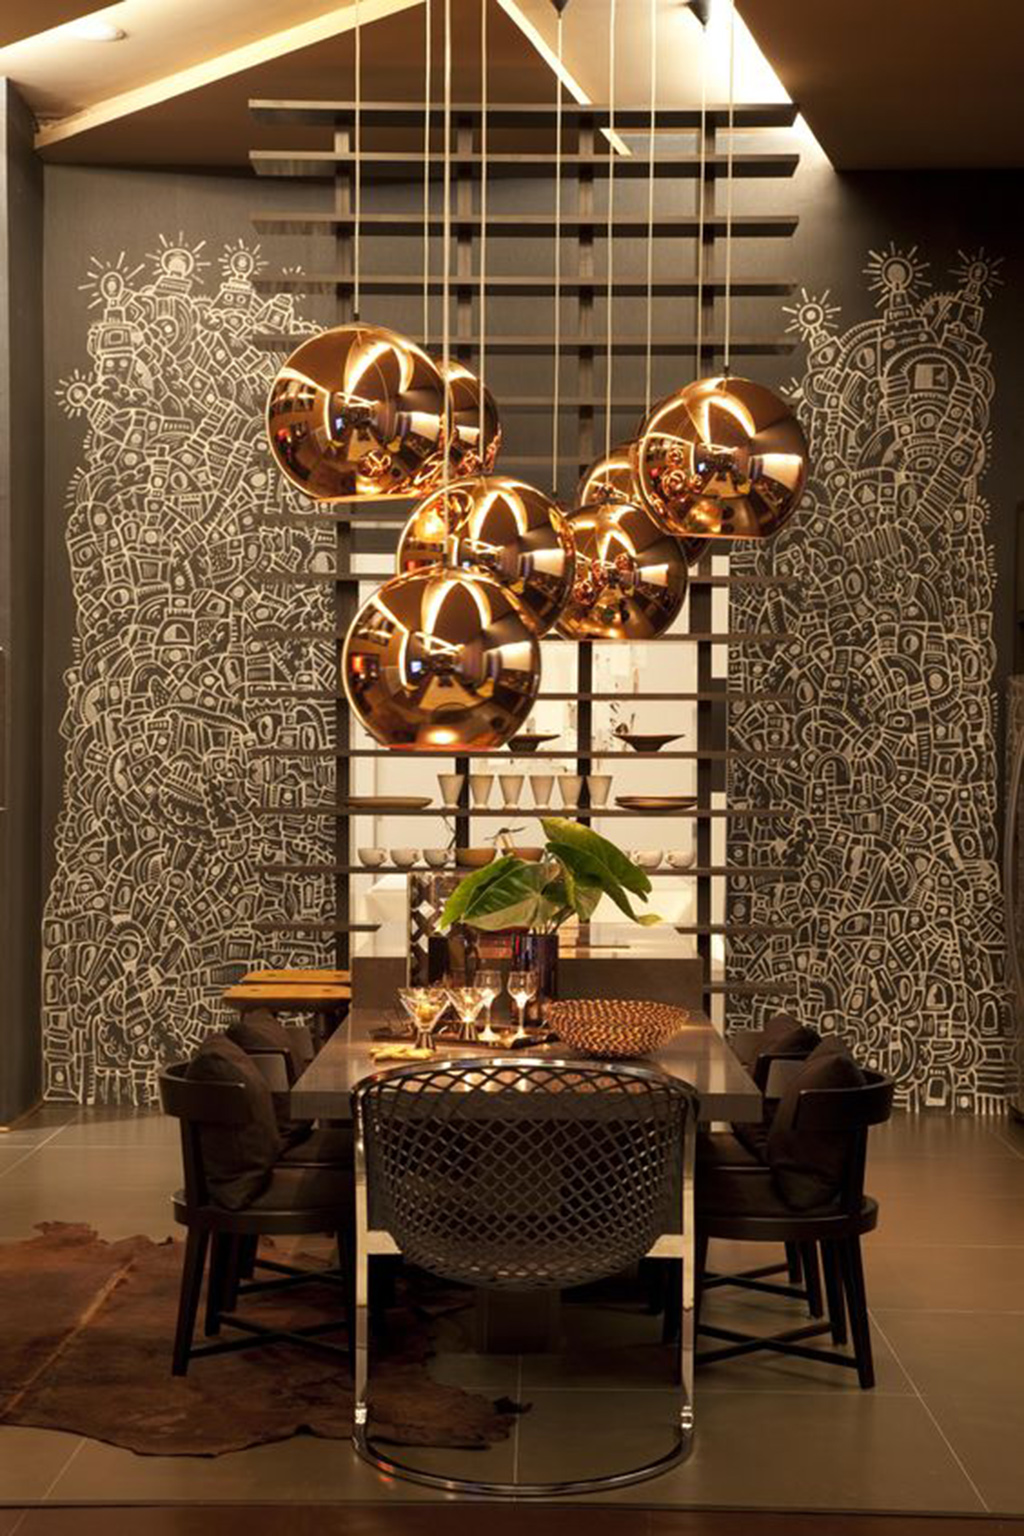 modern suspension lamps Top 10 Modern Suspension Lamps for your Home Decor Top 10 Modern Suspension Lamps for your Home Decor8